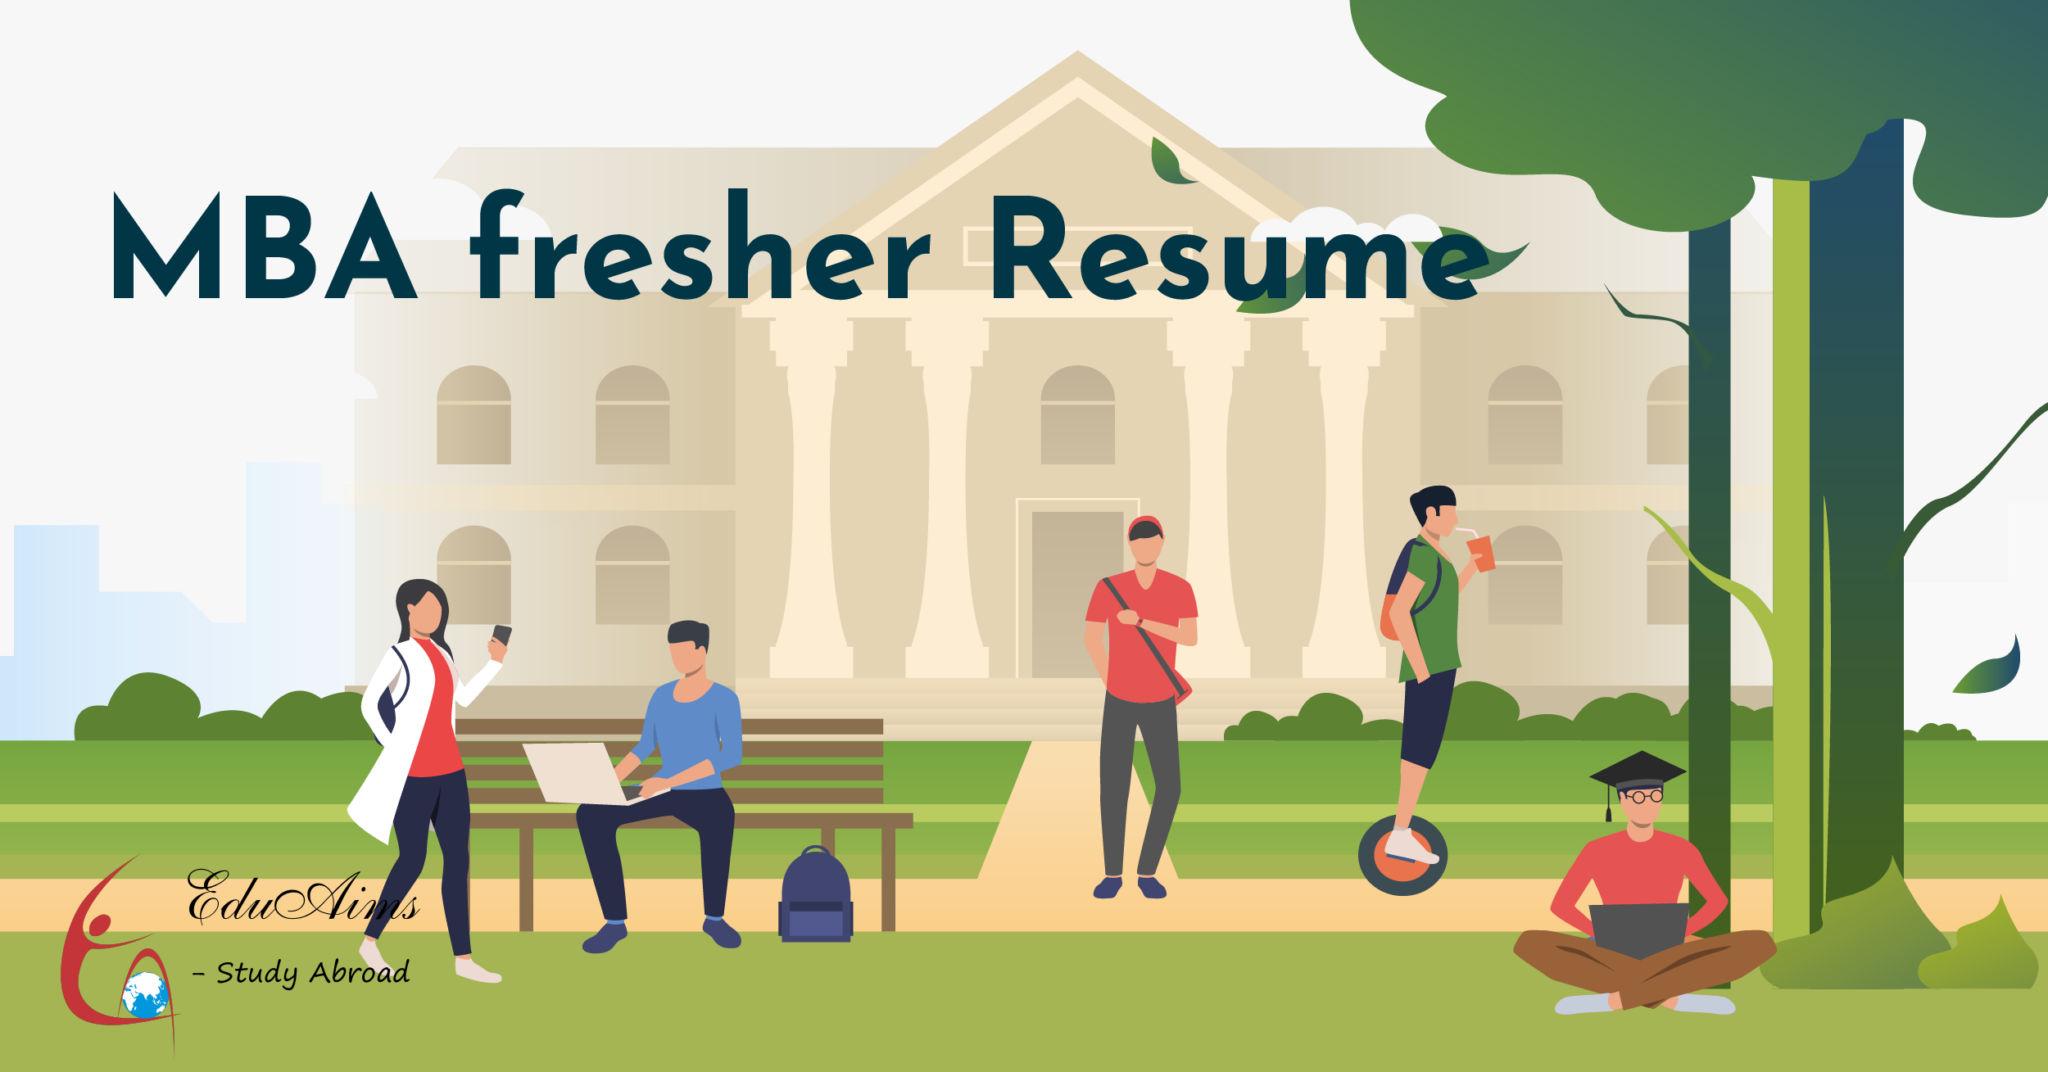 Logo Cover 1to15 13 EduAims MBA Fresher Resume